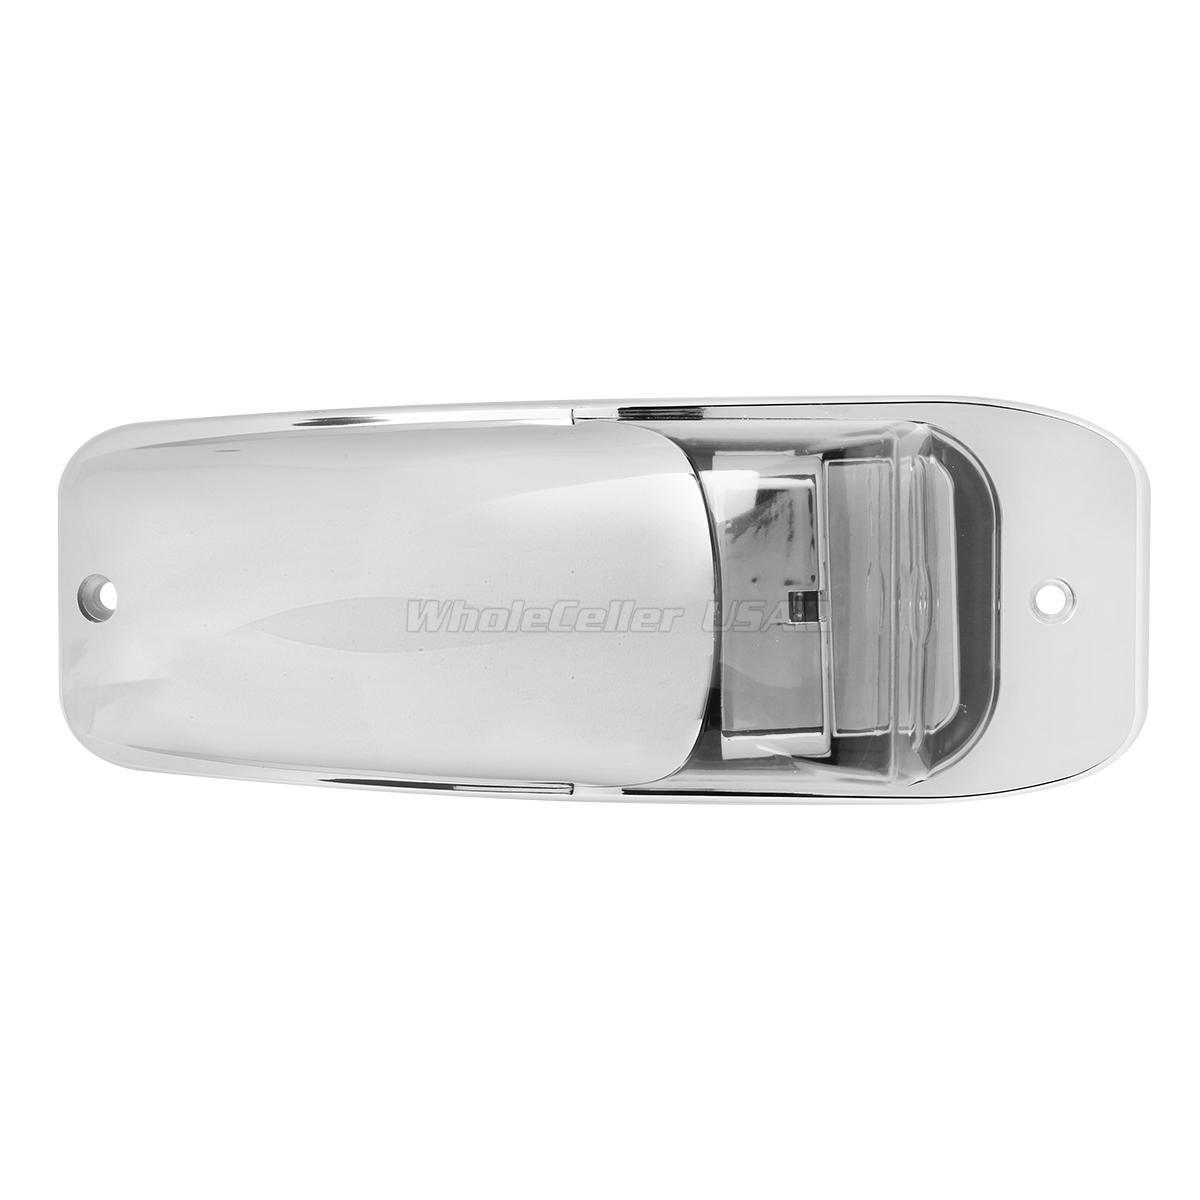 5x Chrome 7led Cab Light Clear Amber For Peterbilt For